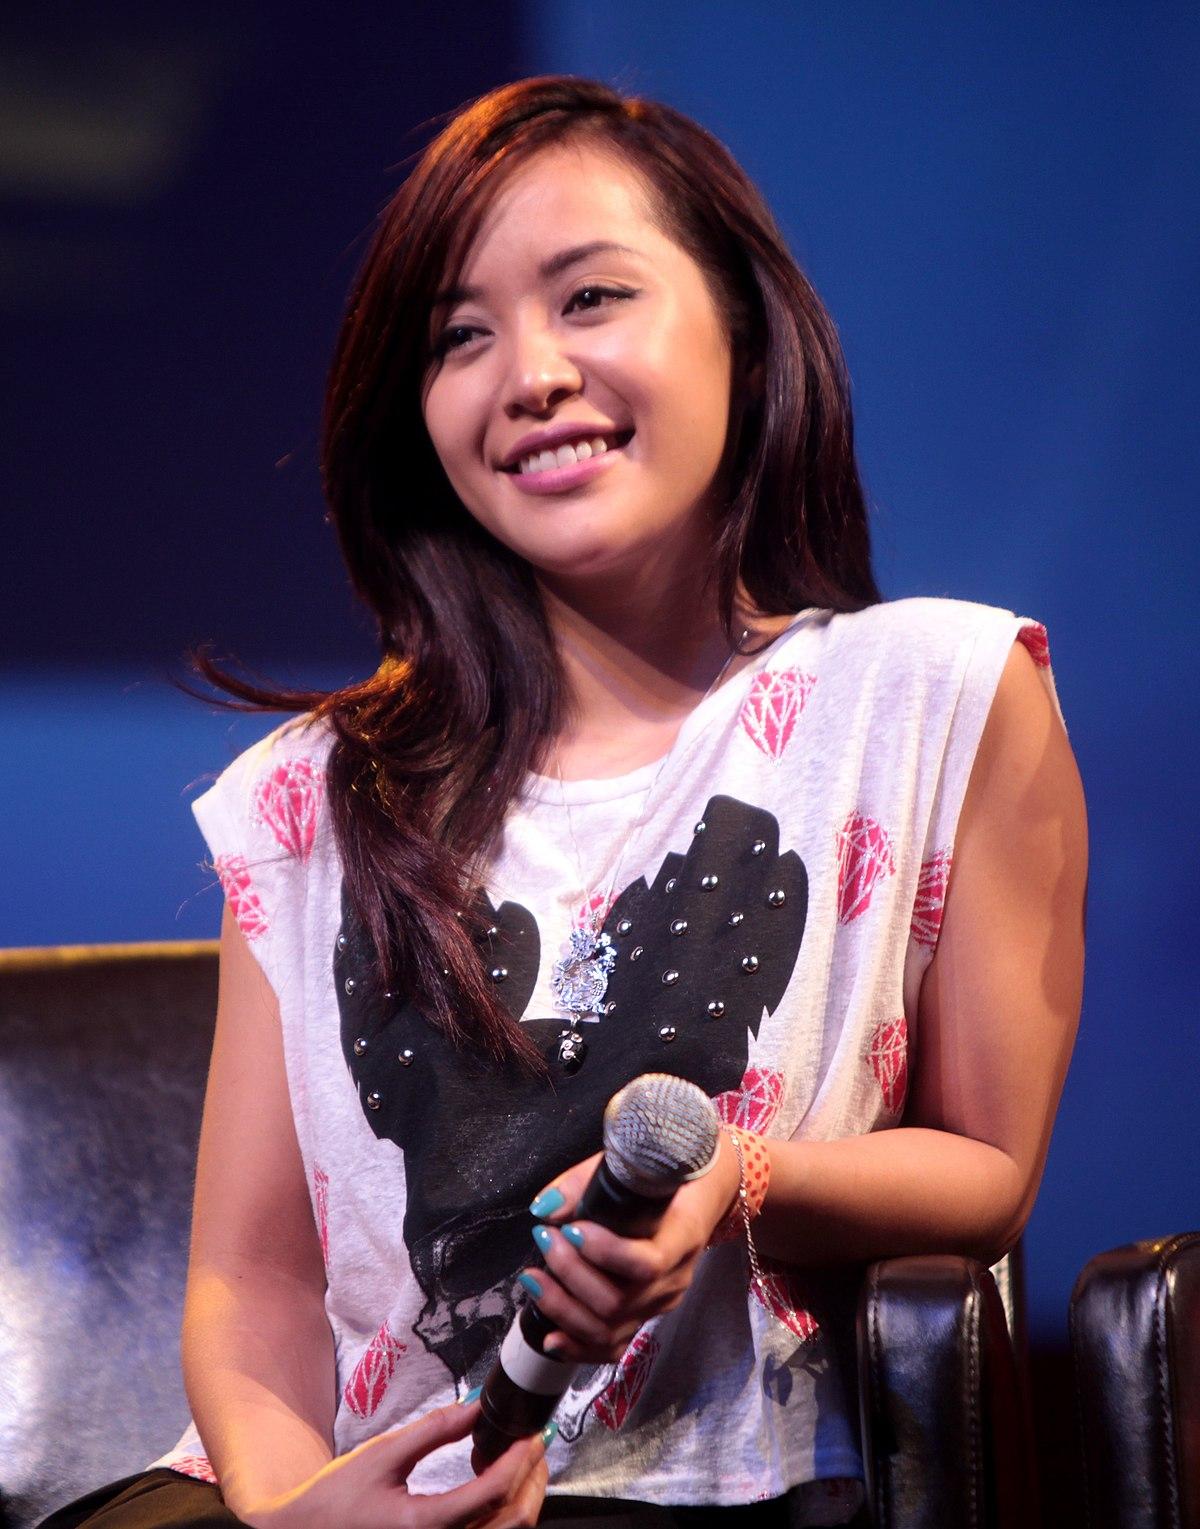 Michelle Phan Wikipedia